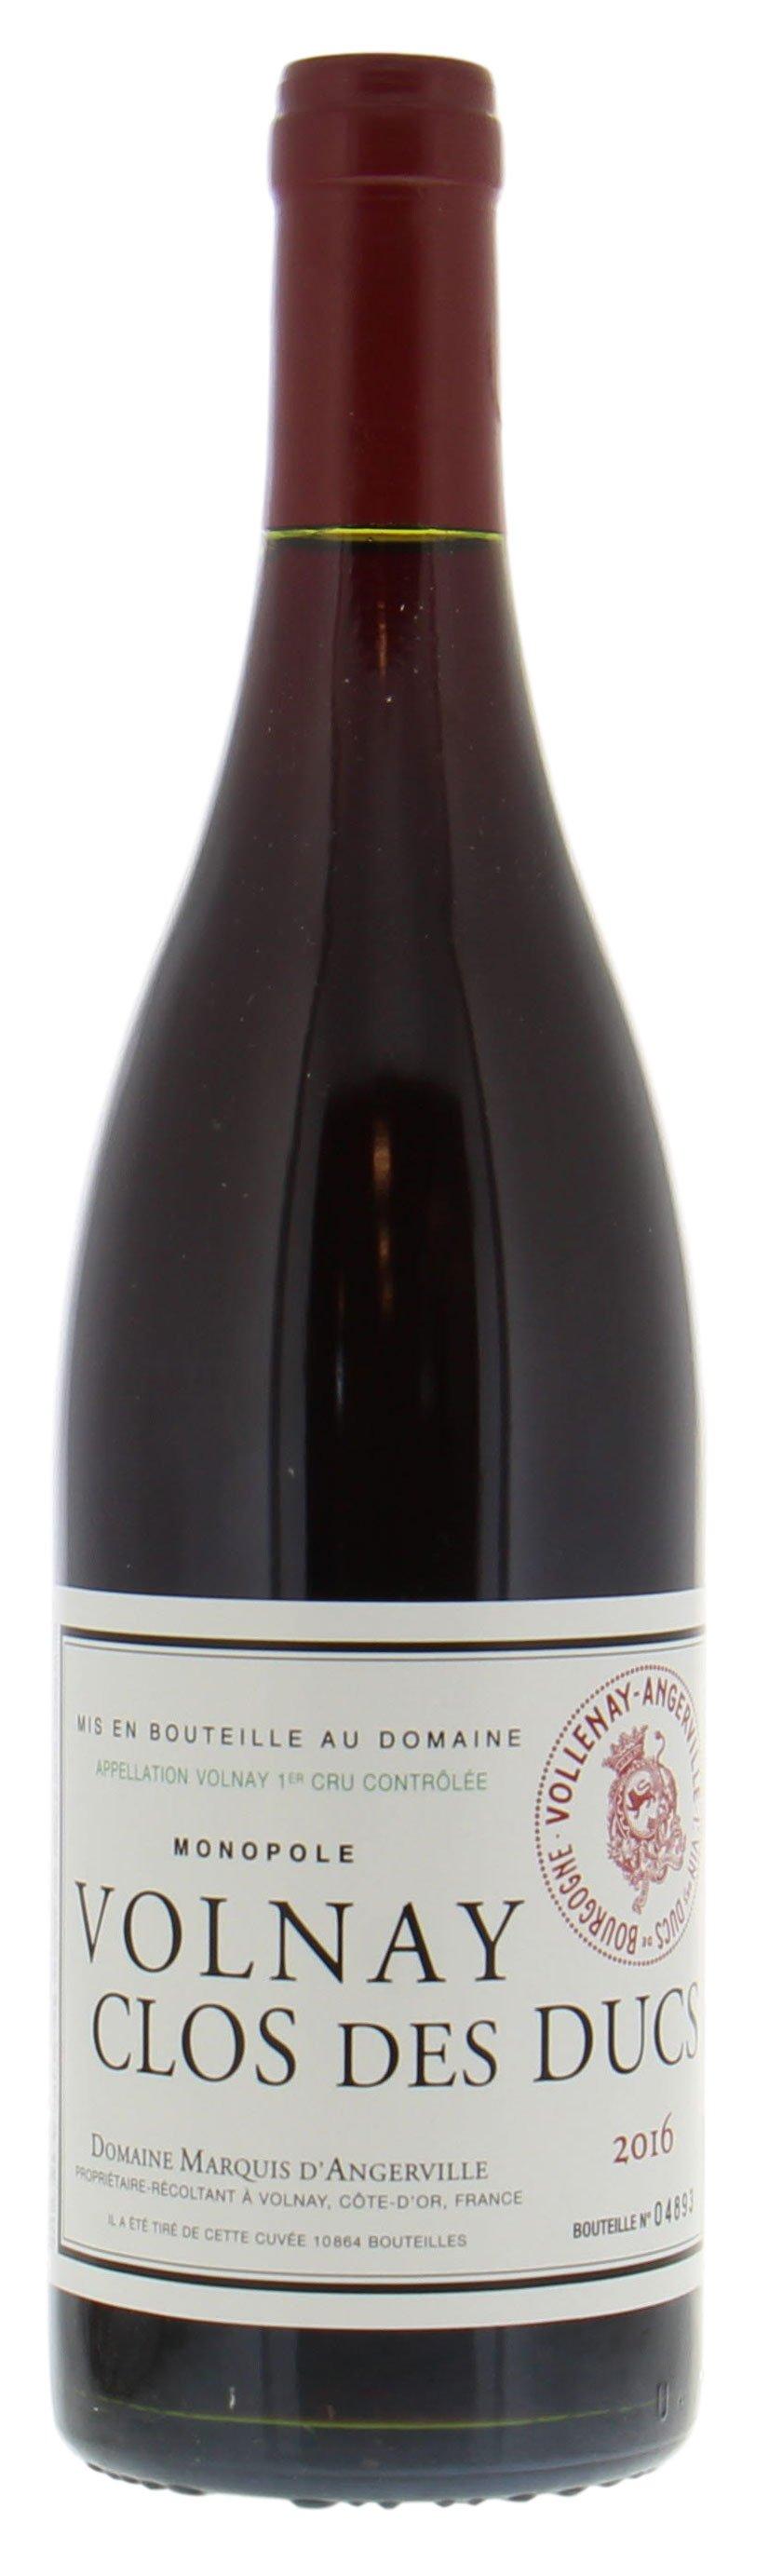 Volnay Clos Des Ducs 2016 Marquis D Angerville Buy Online Best Of Wines